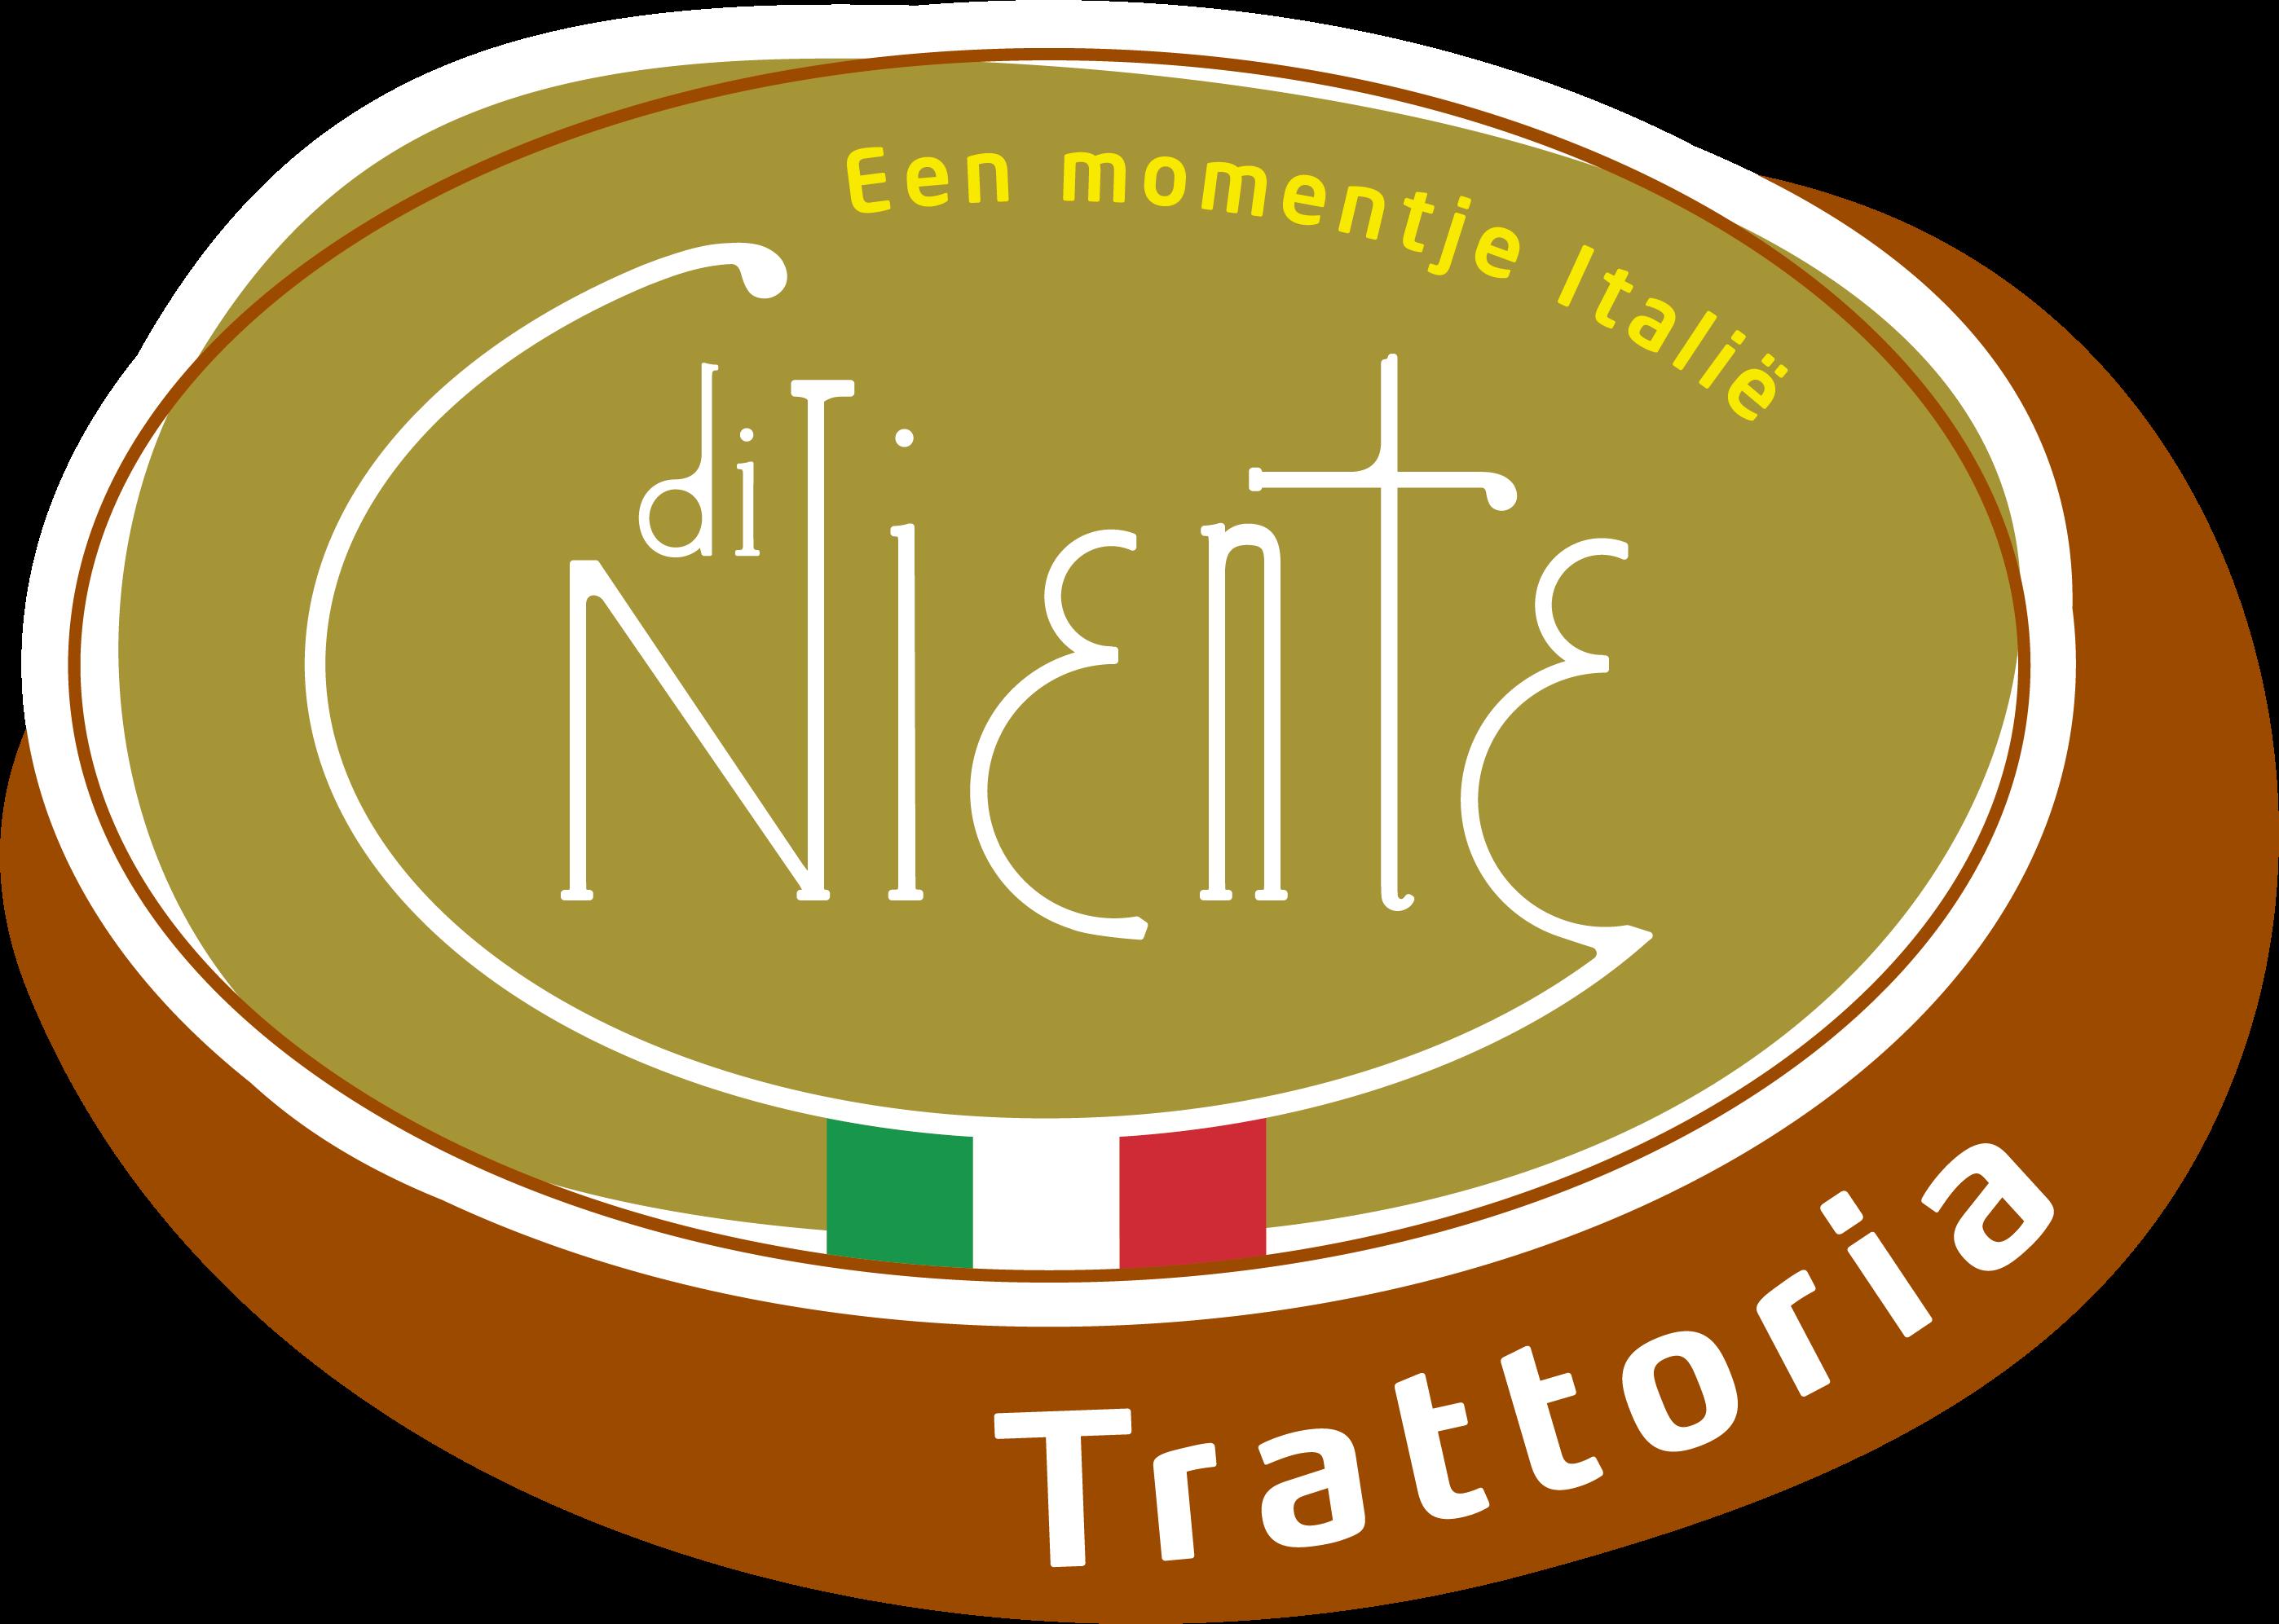 Diniente Trattoria logo